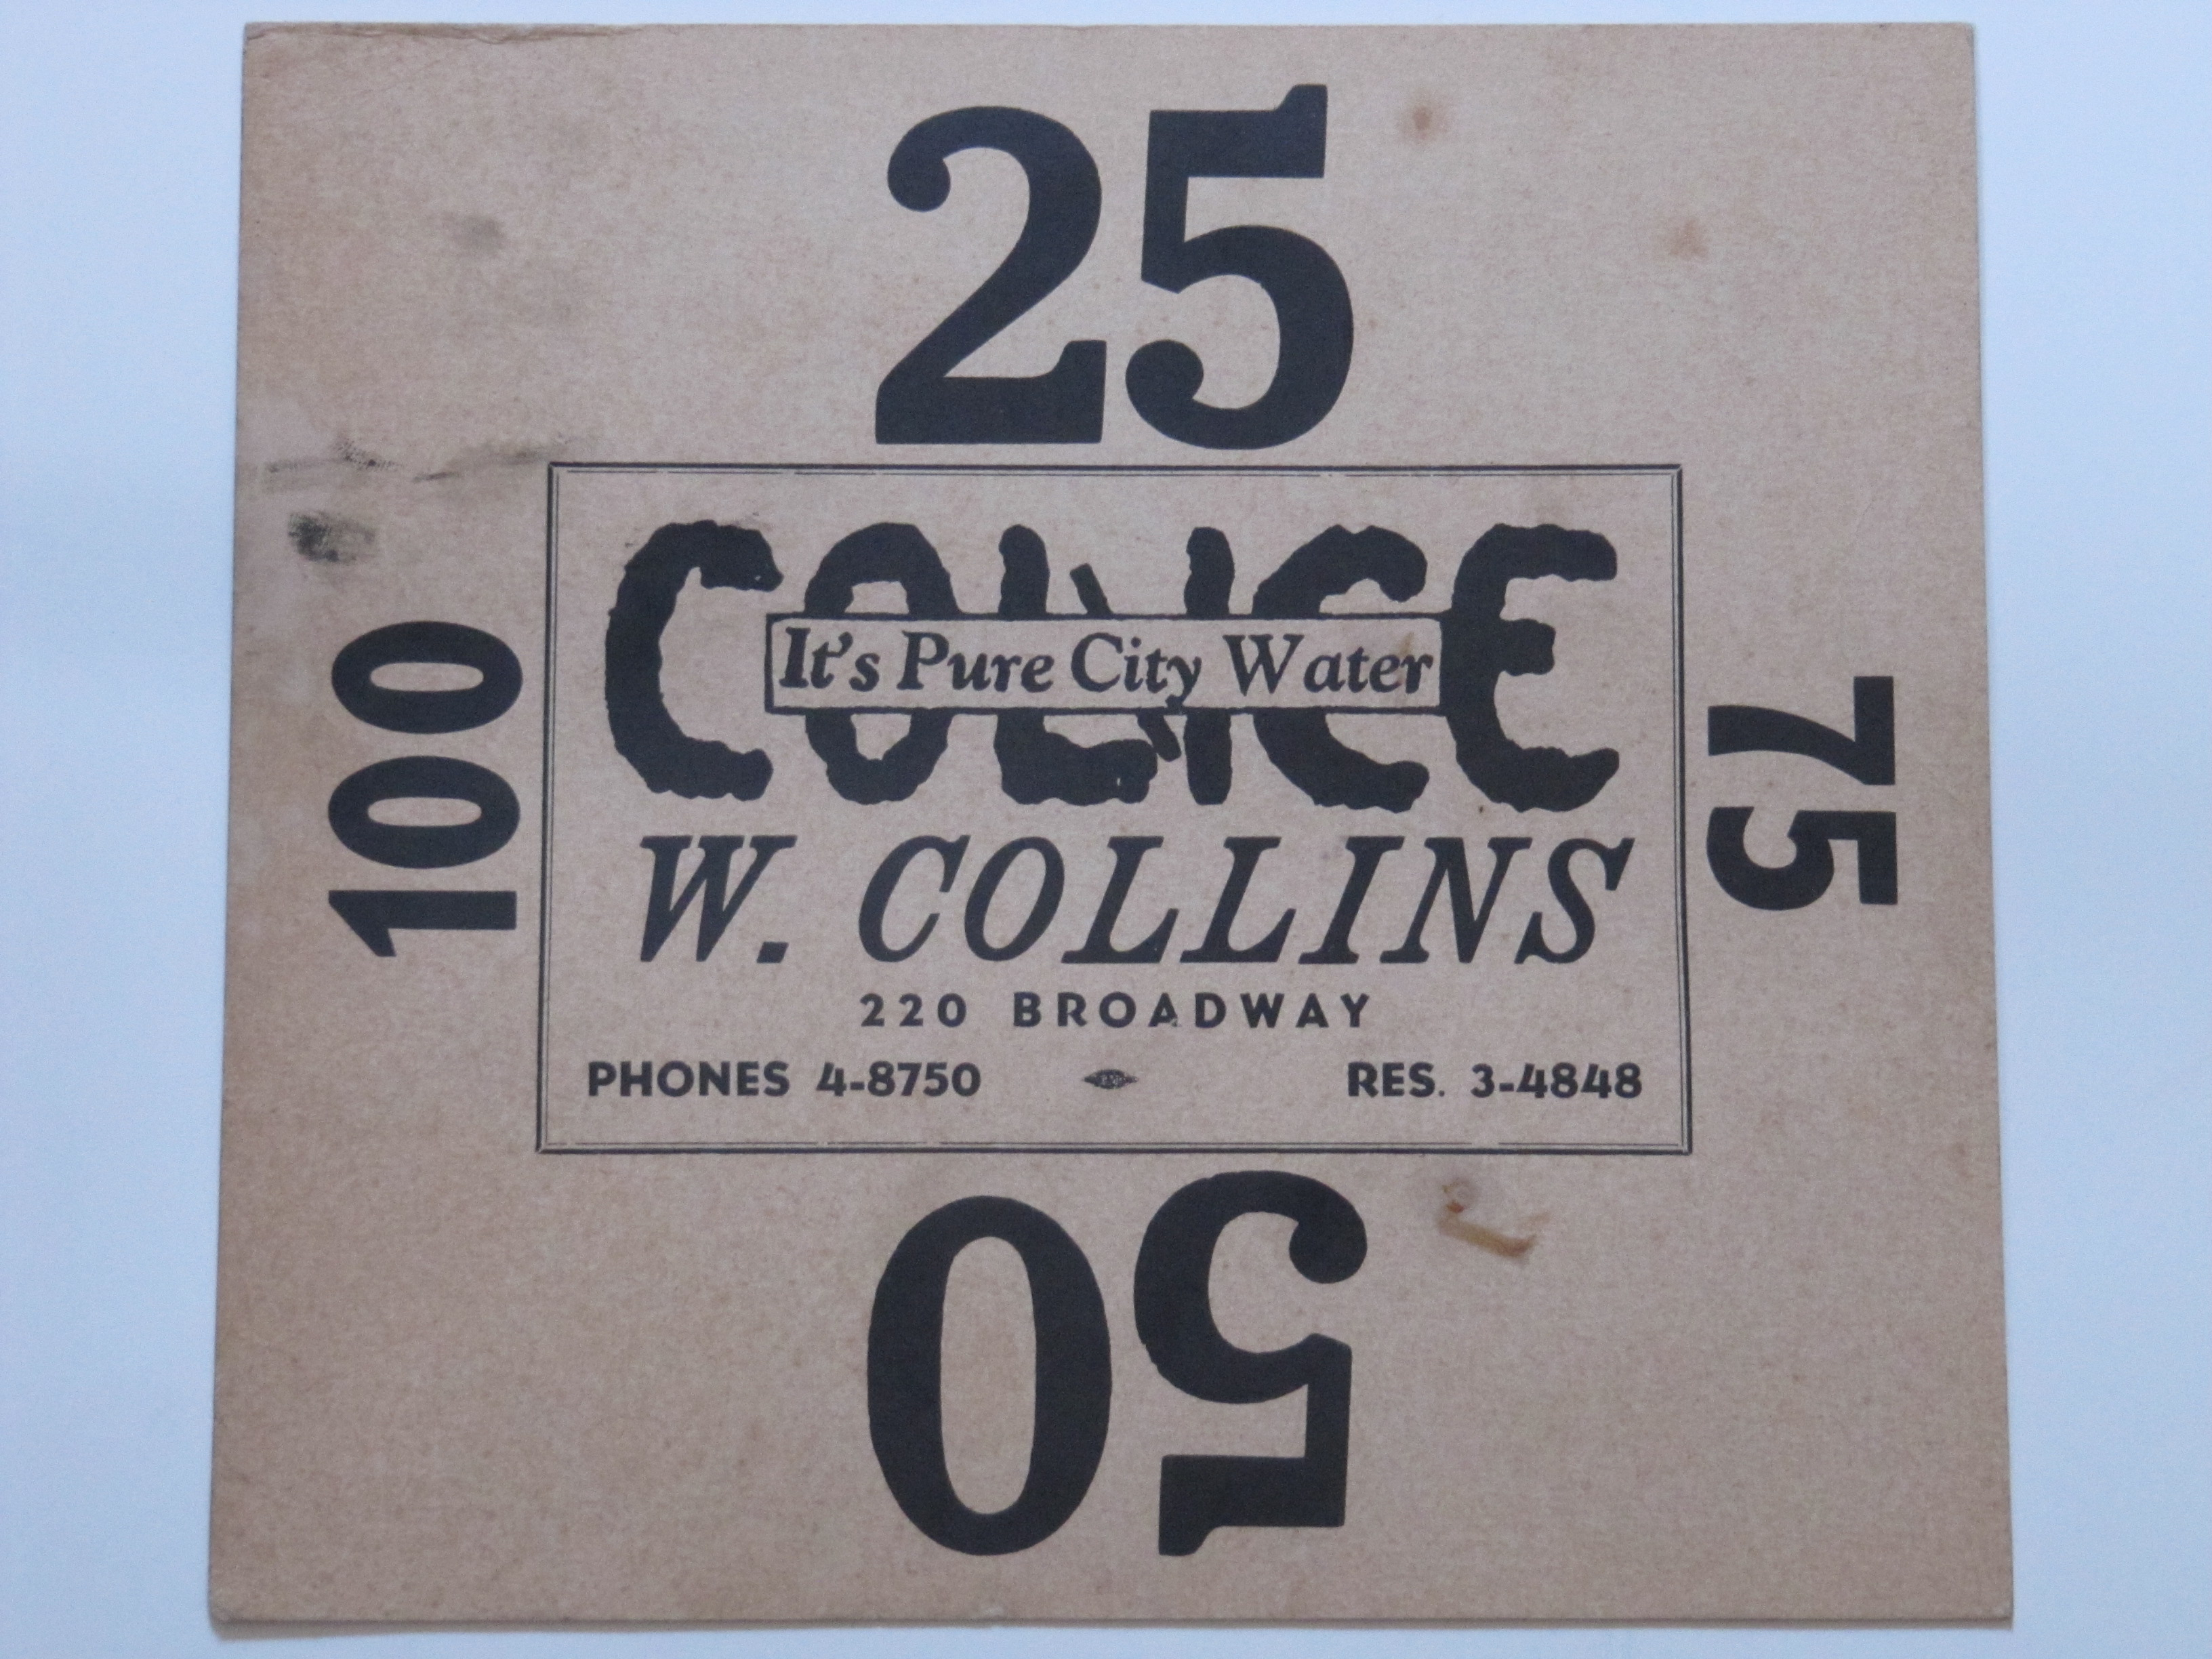 W. Collins